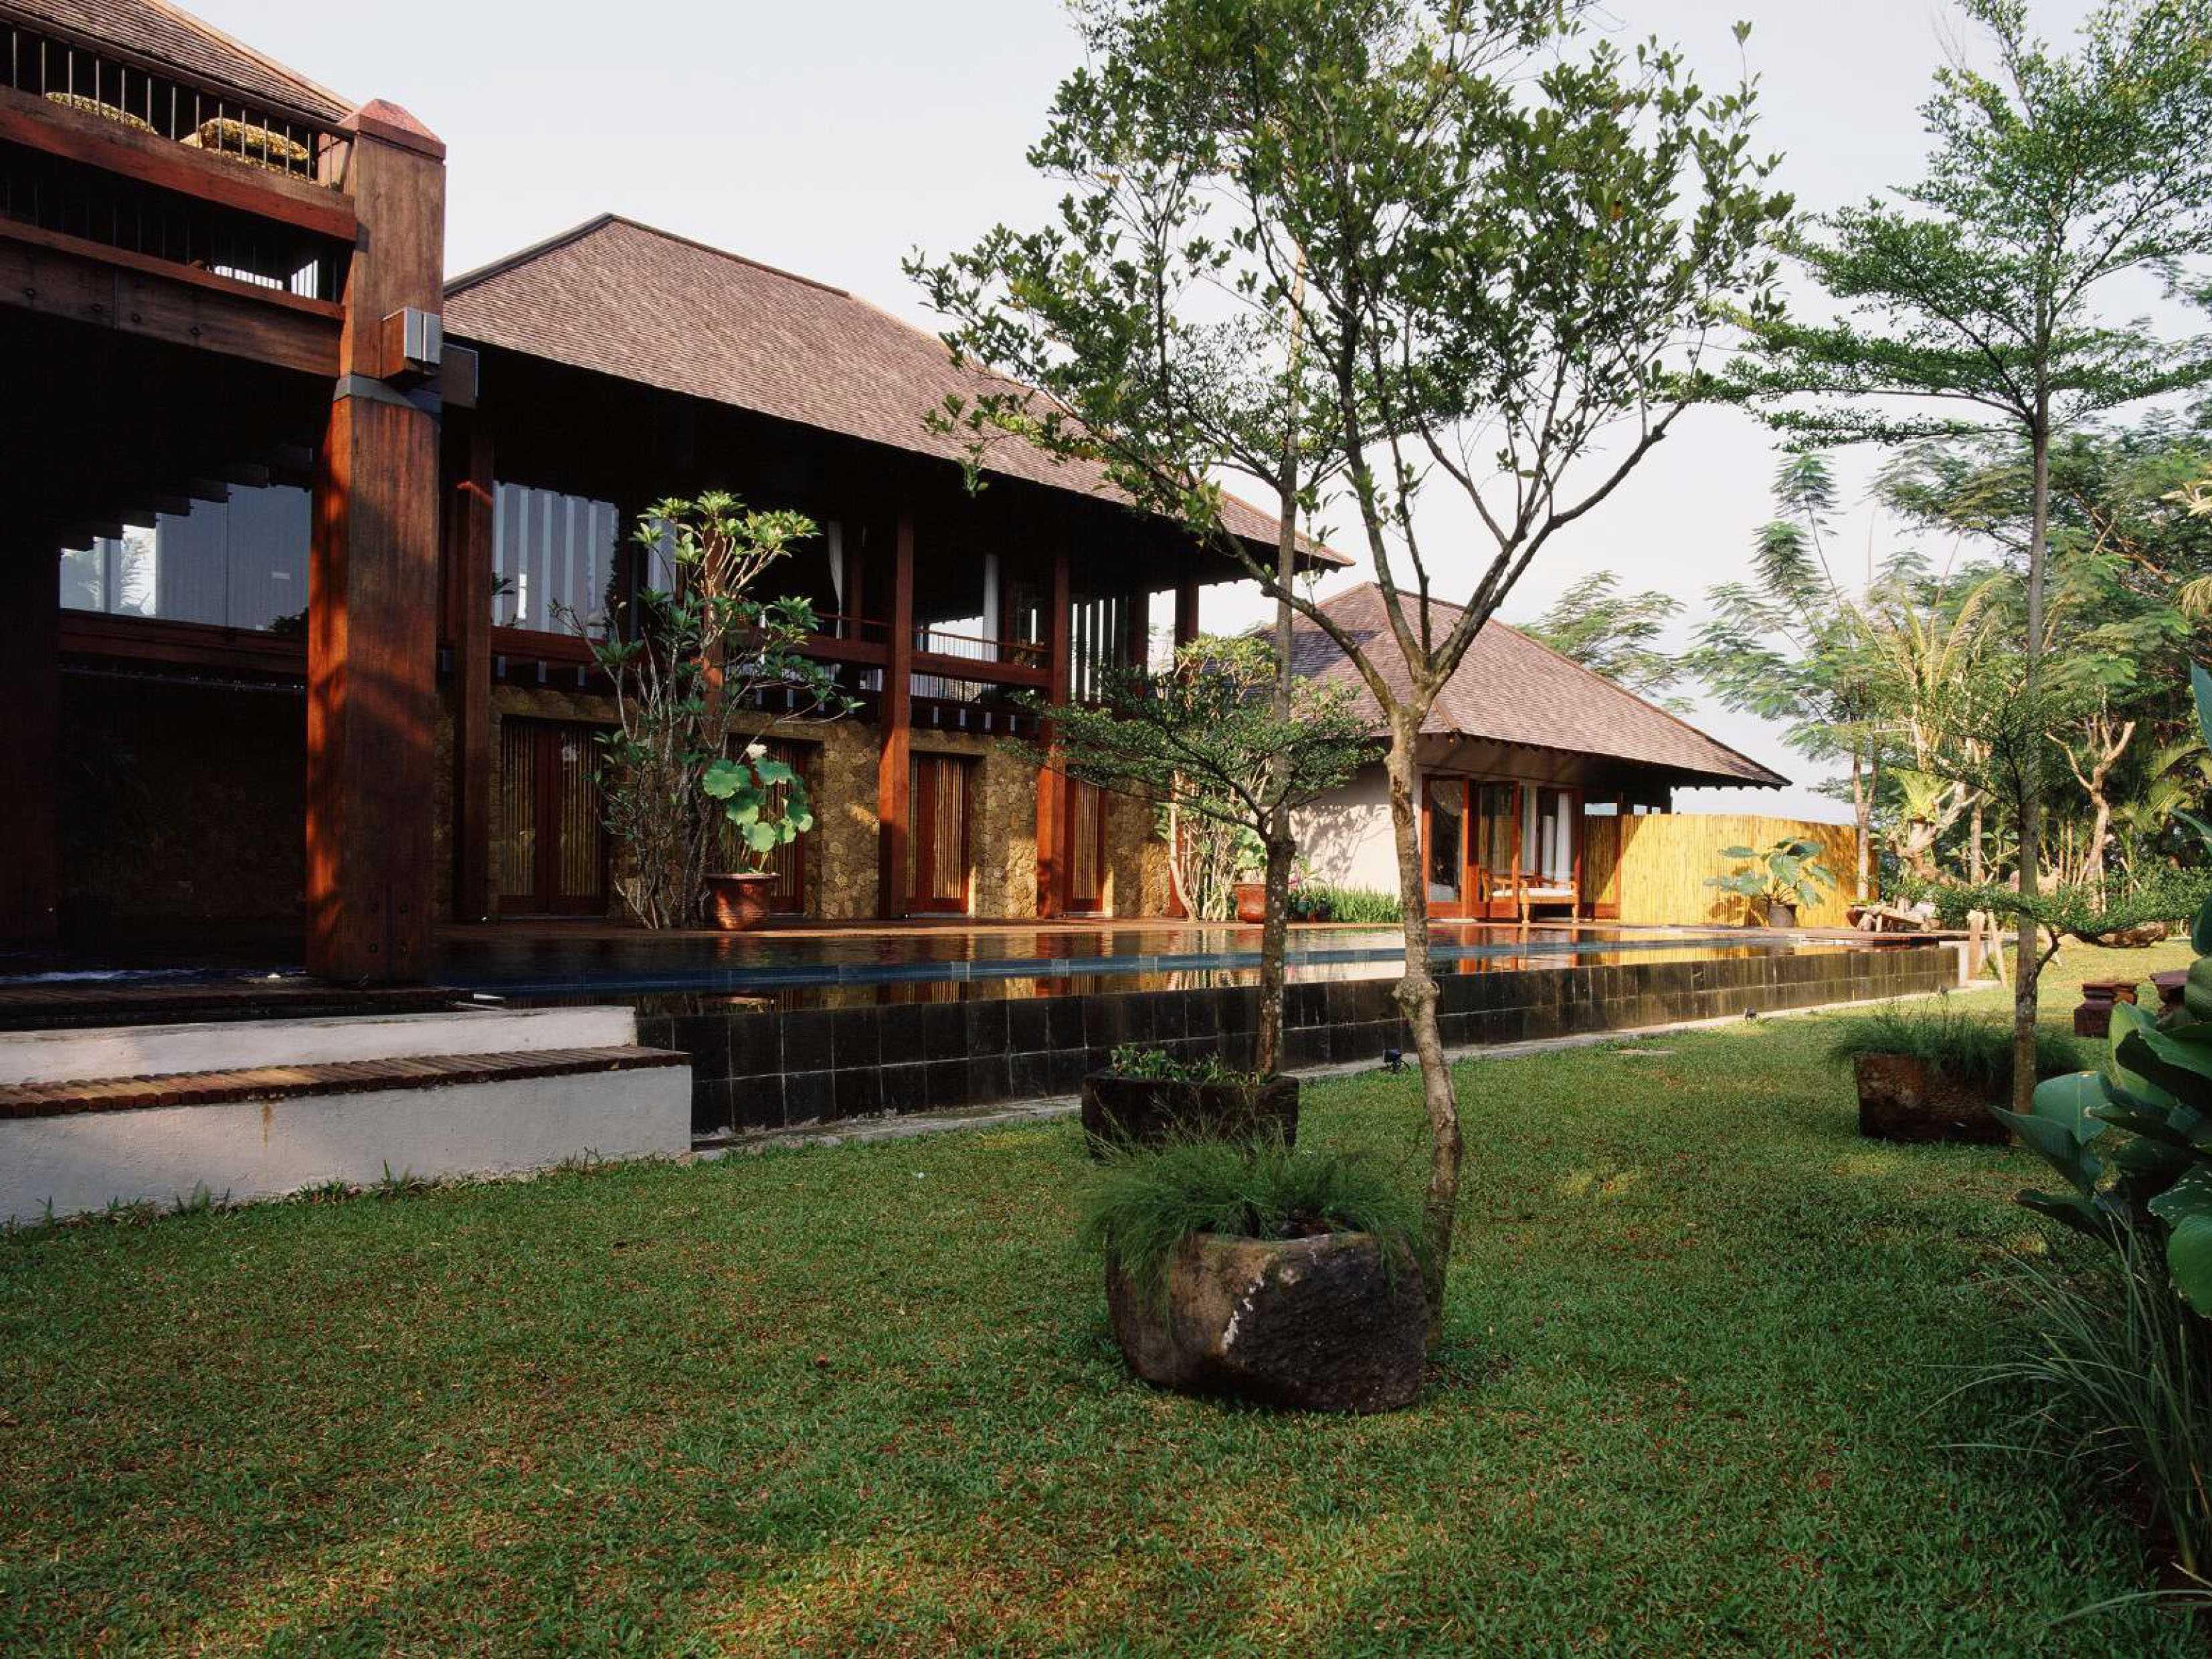 Studio Air Putih Ak_House Rancamaya, Bogor Rancamaya, Bogor Garden Area Tradisional  25013